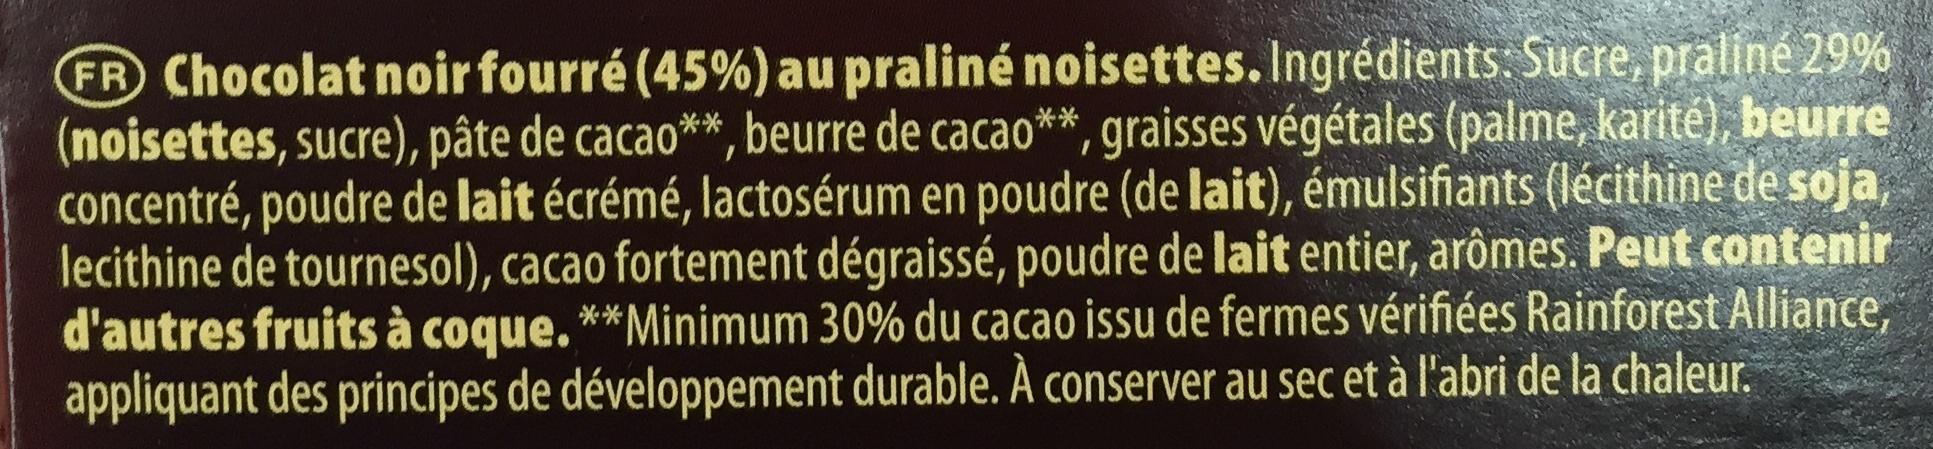 Praliné Fondant Noir - Ingredients - fr